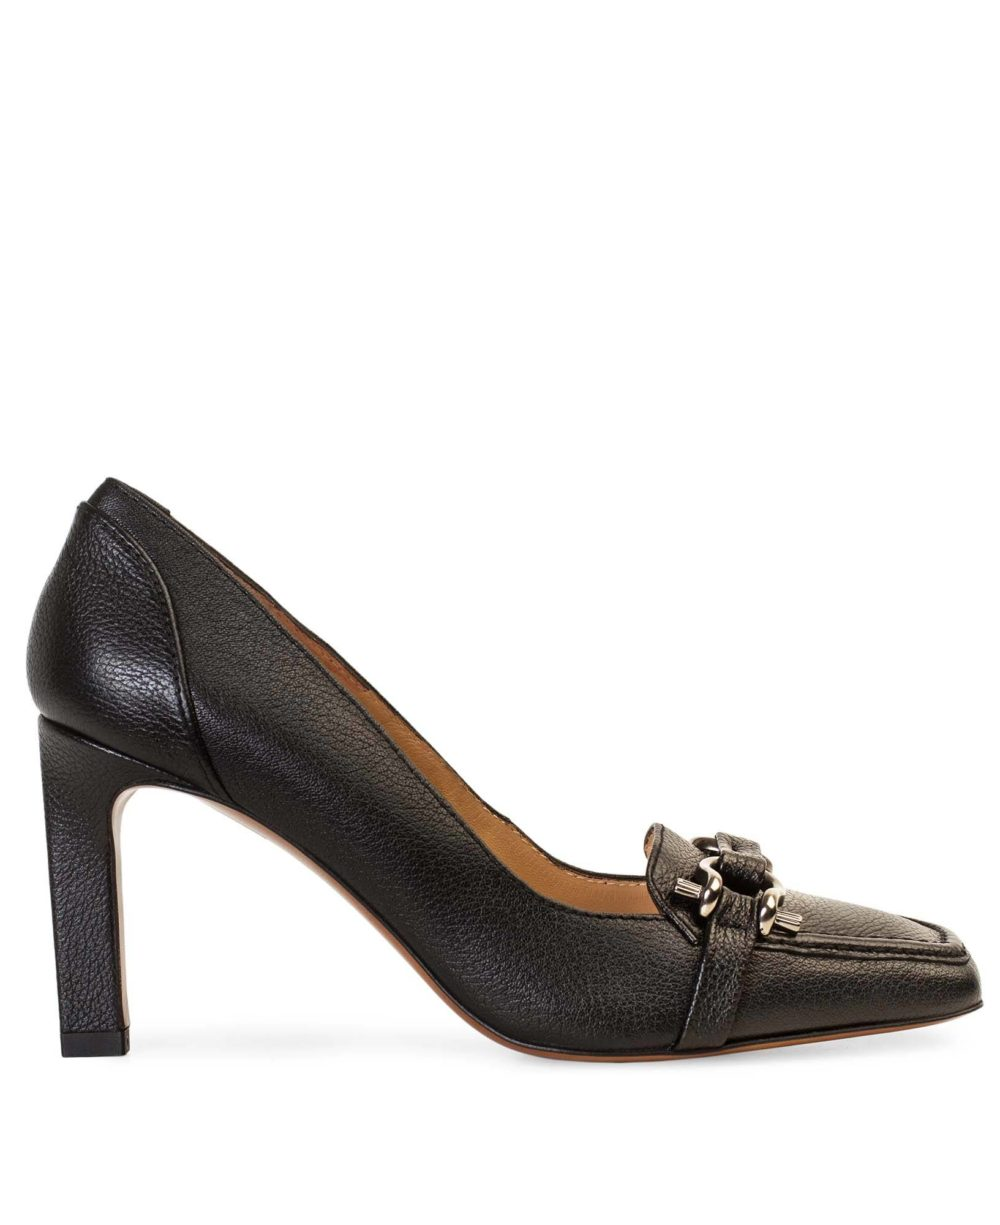 Zapatos de piel Paco GIl - P-3871 Black Bufalo P